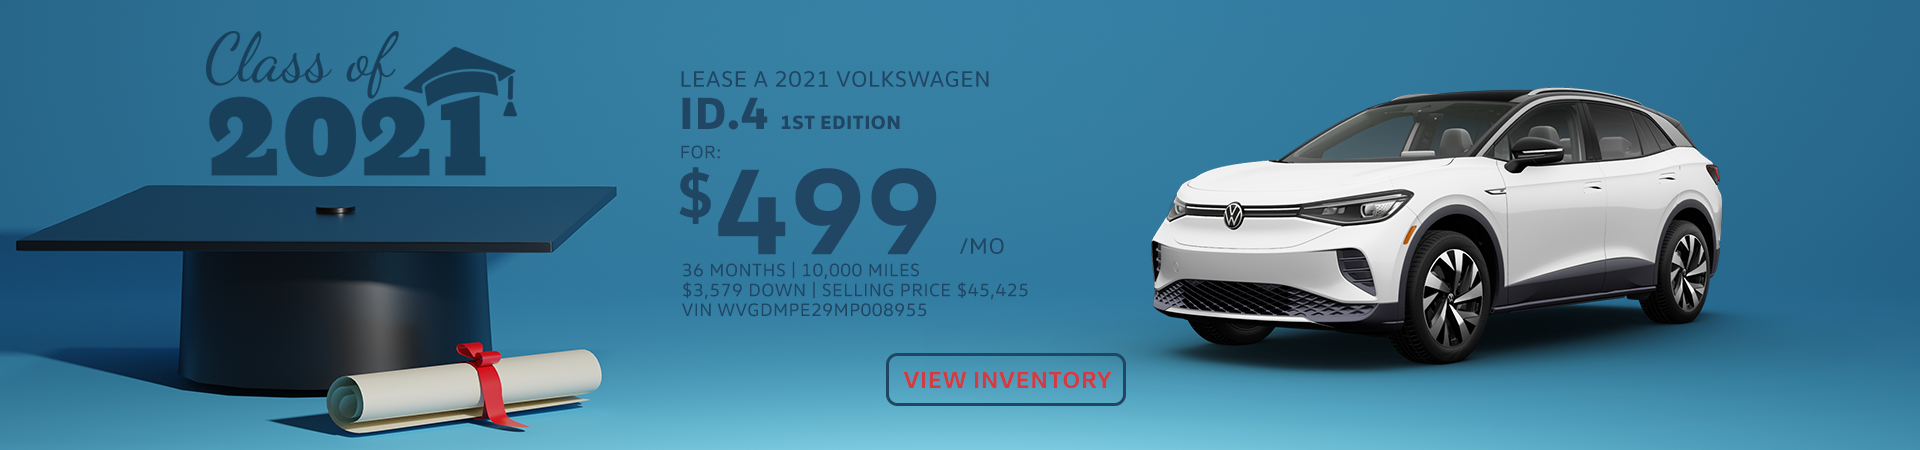 Stohlman VW_June Offer_ID4